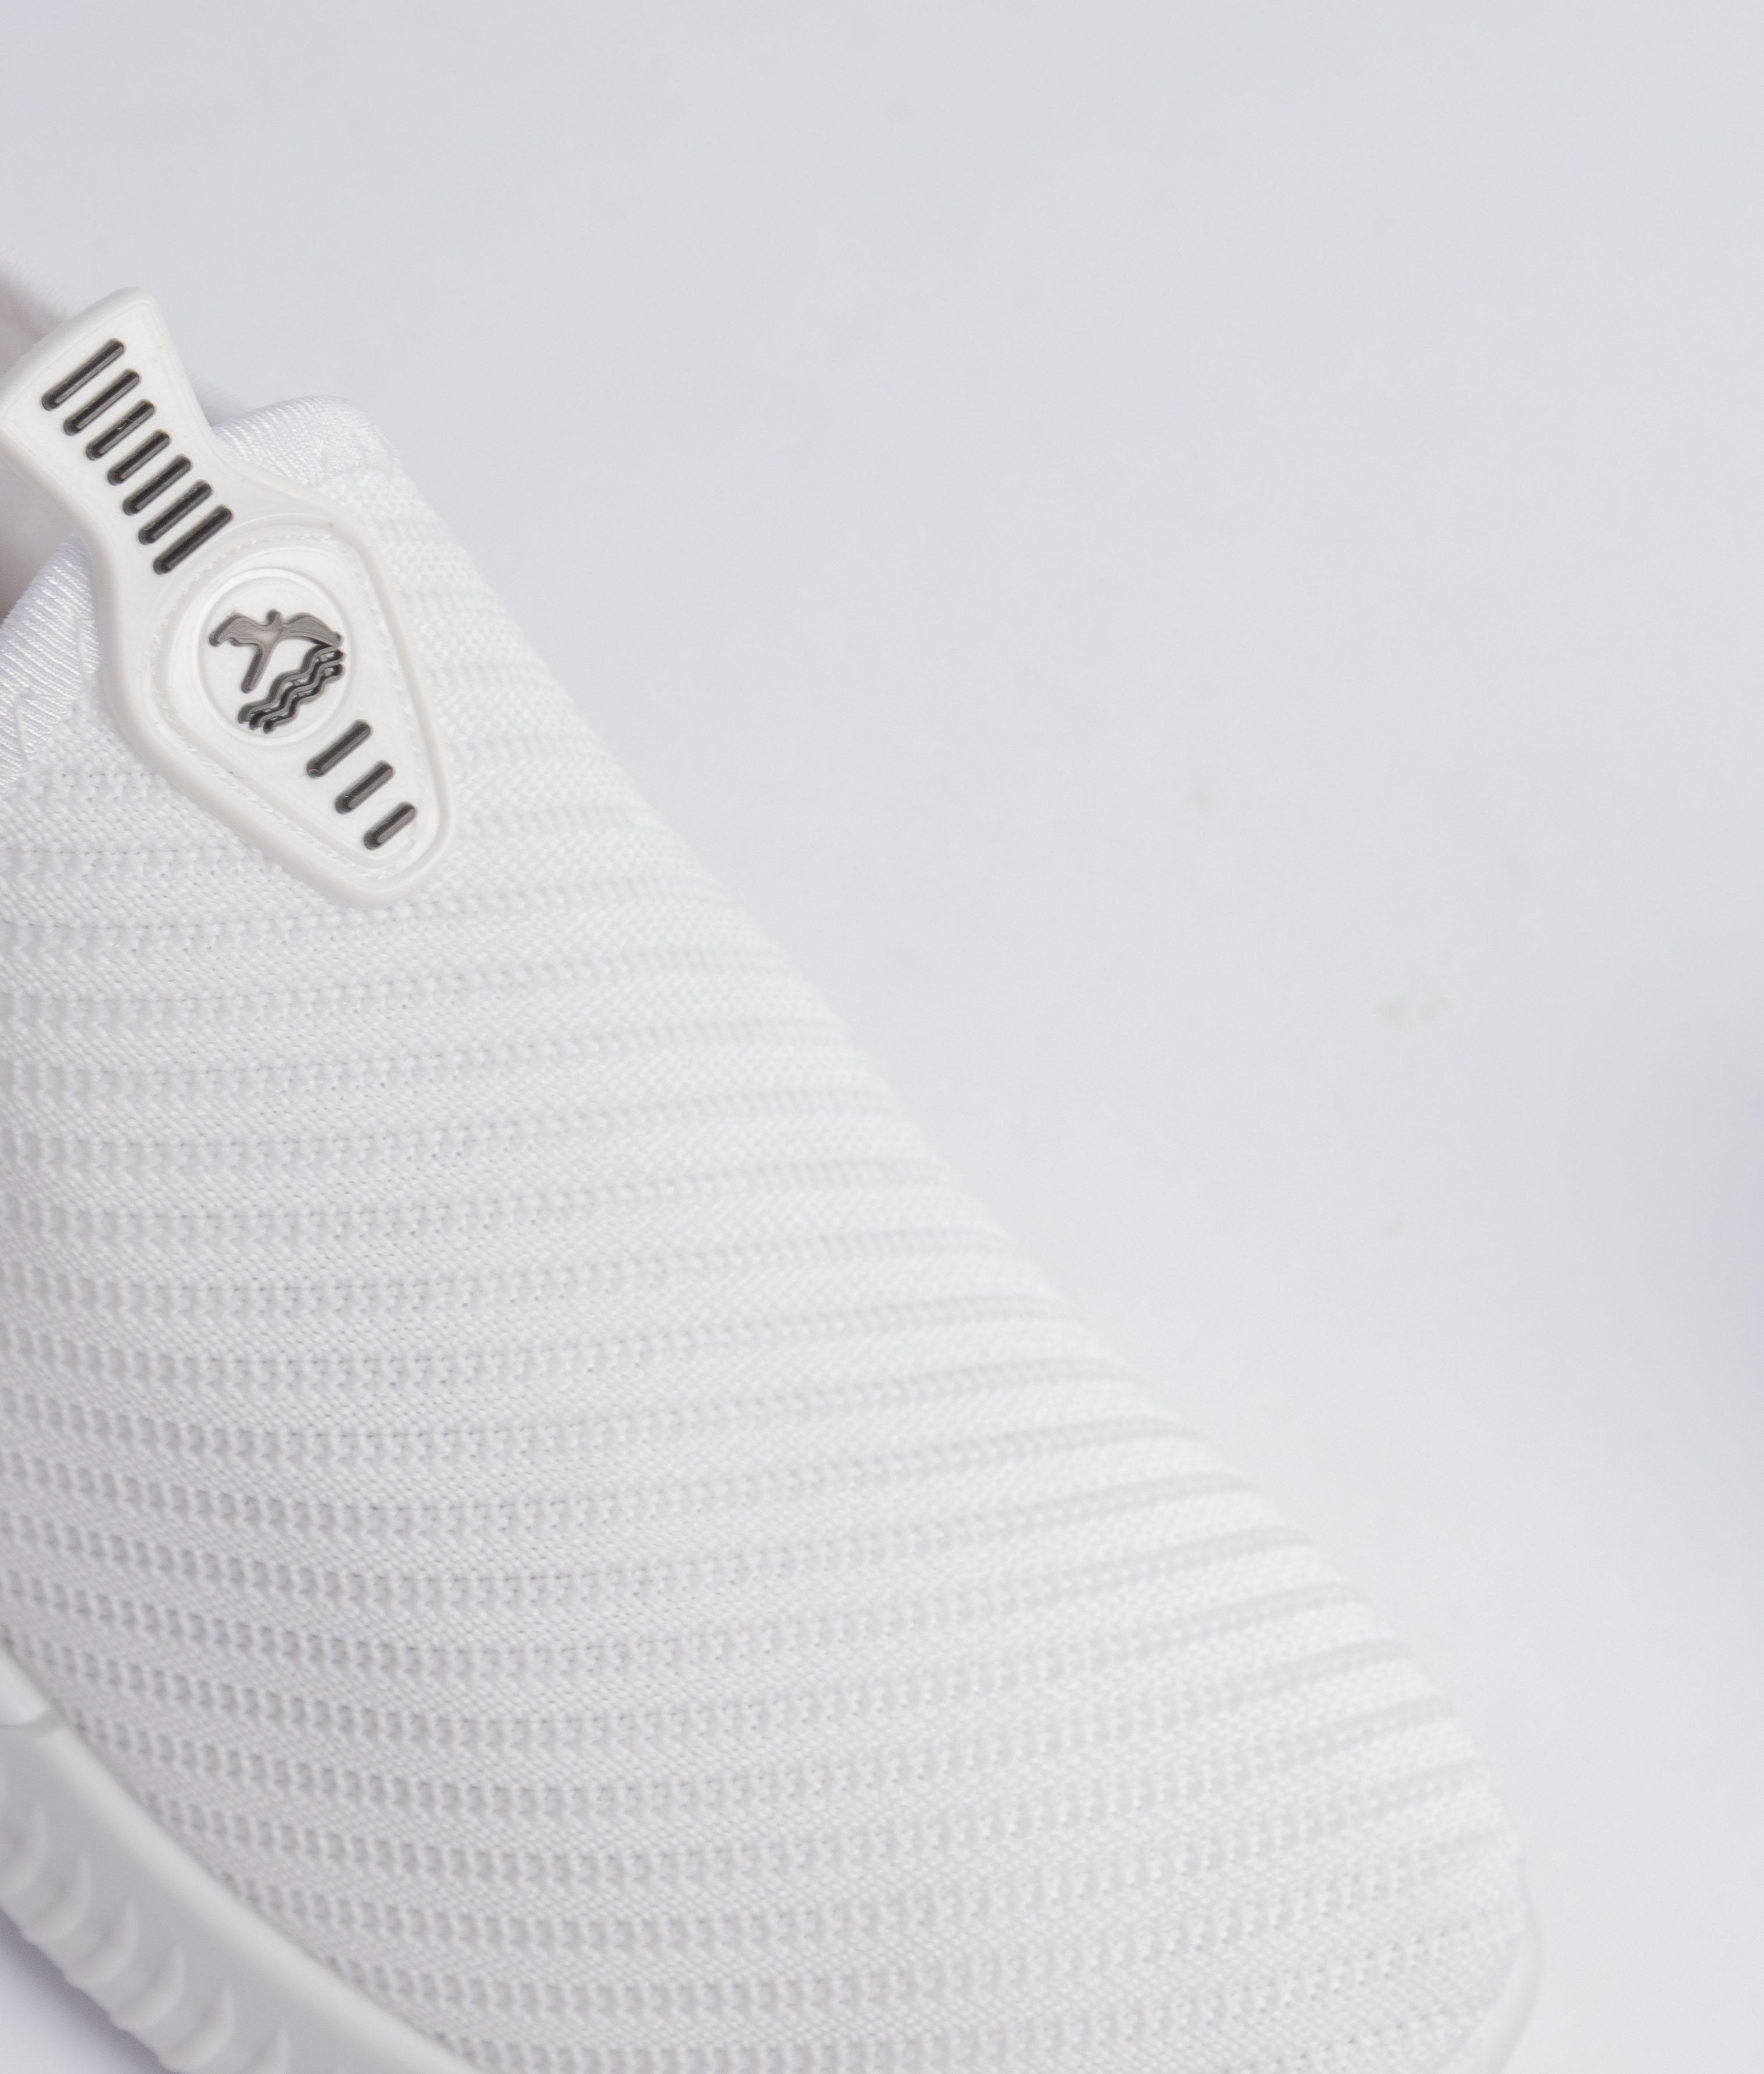 Sneakers Conta - Branco